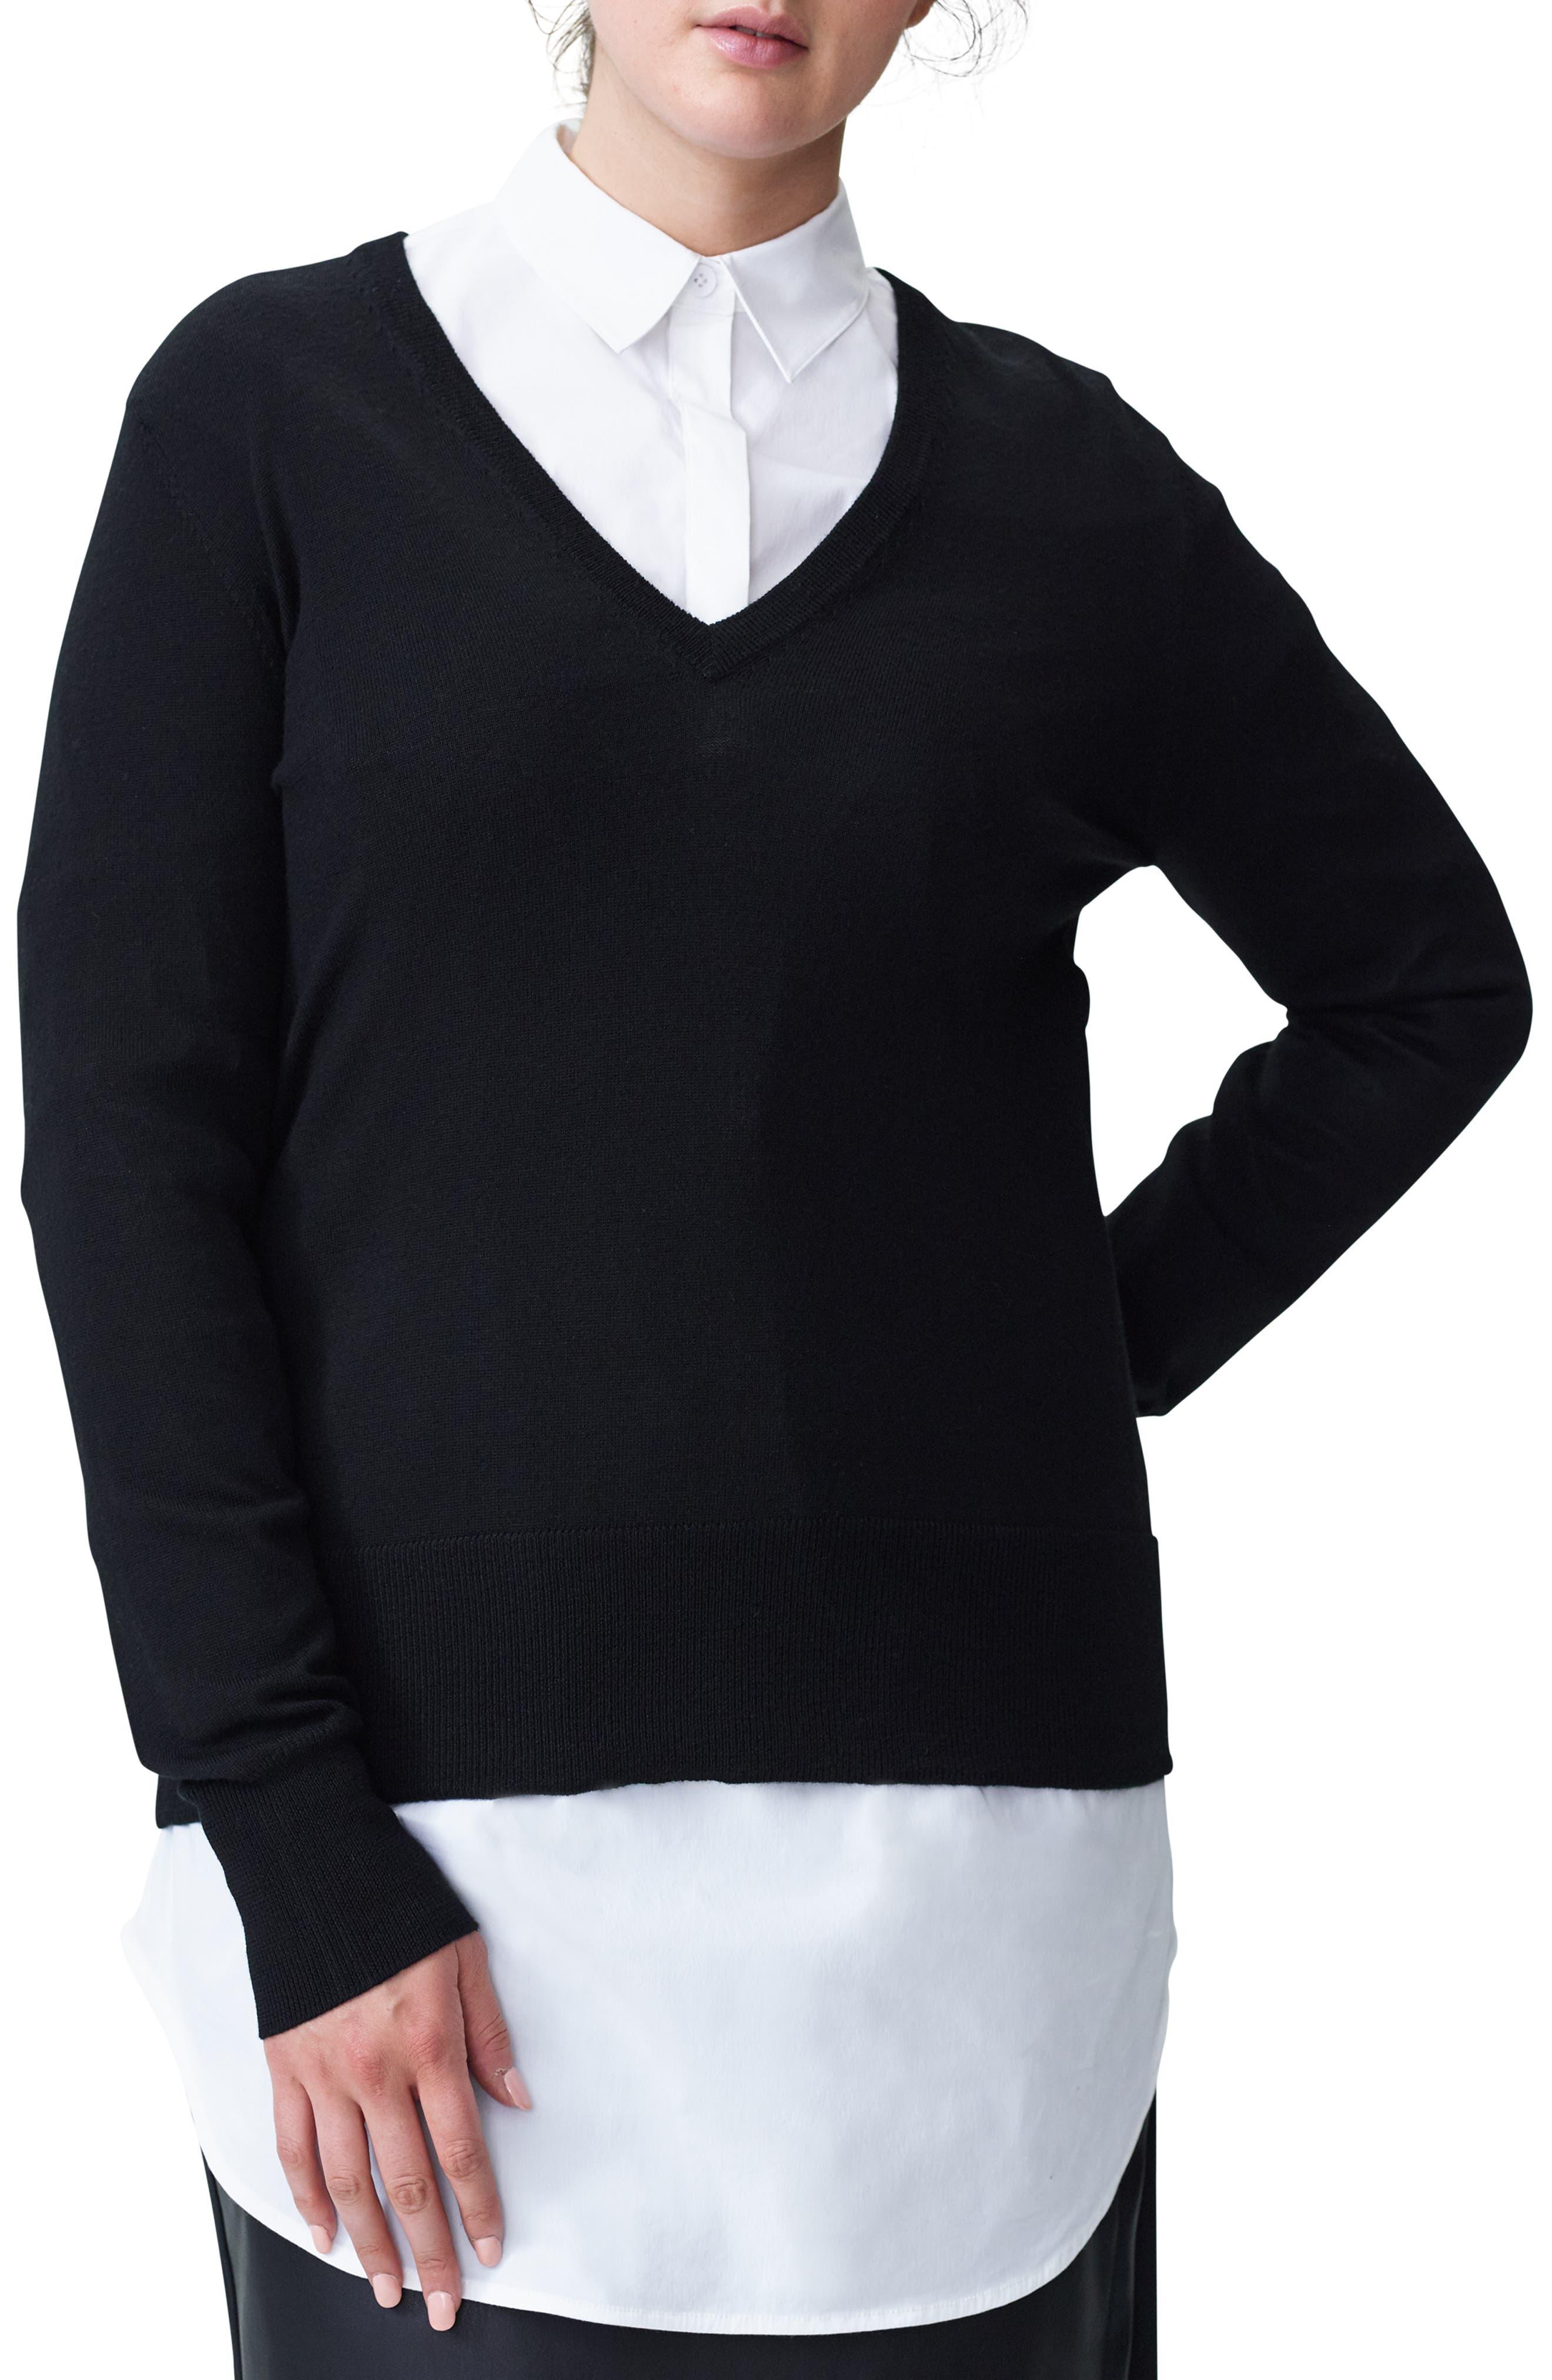 Plus Size Universal Standard Phebe Wool Sweater, Size M (18W-20W) - Black